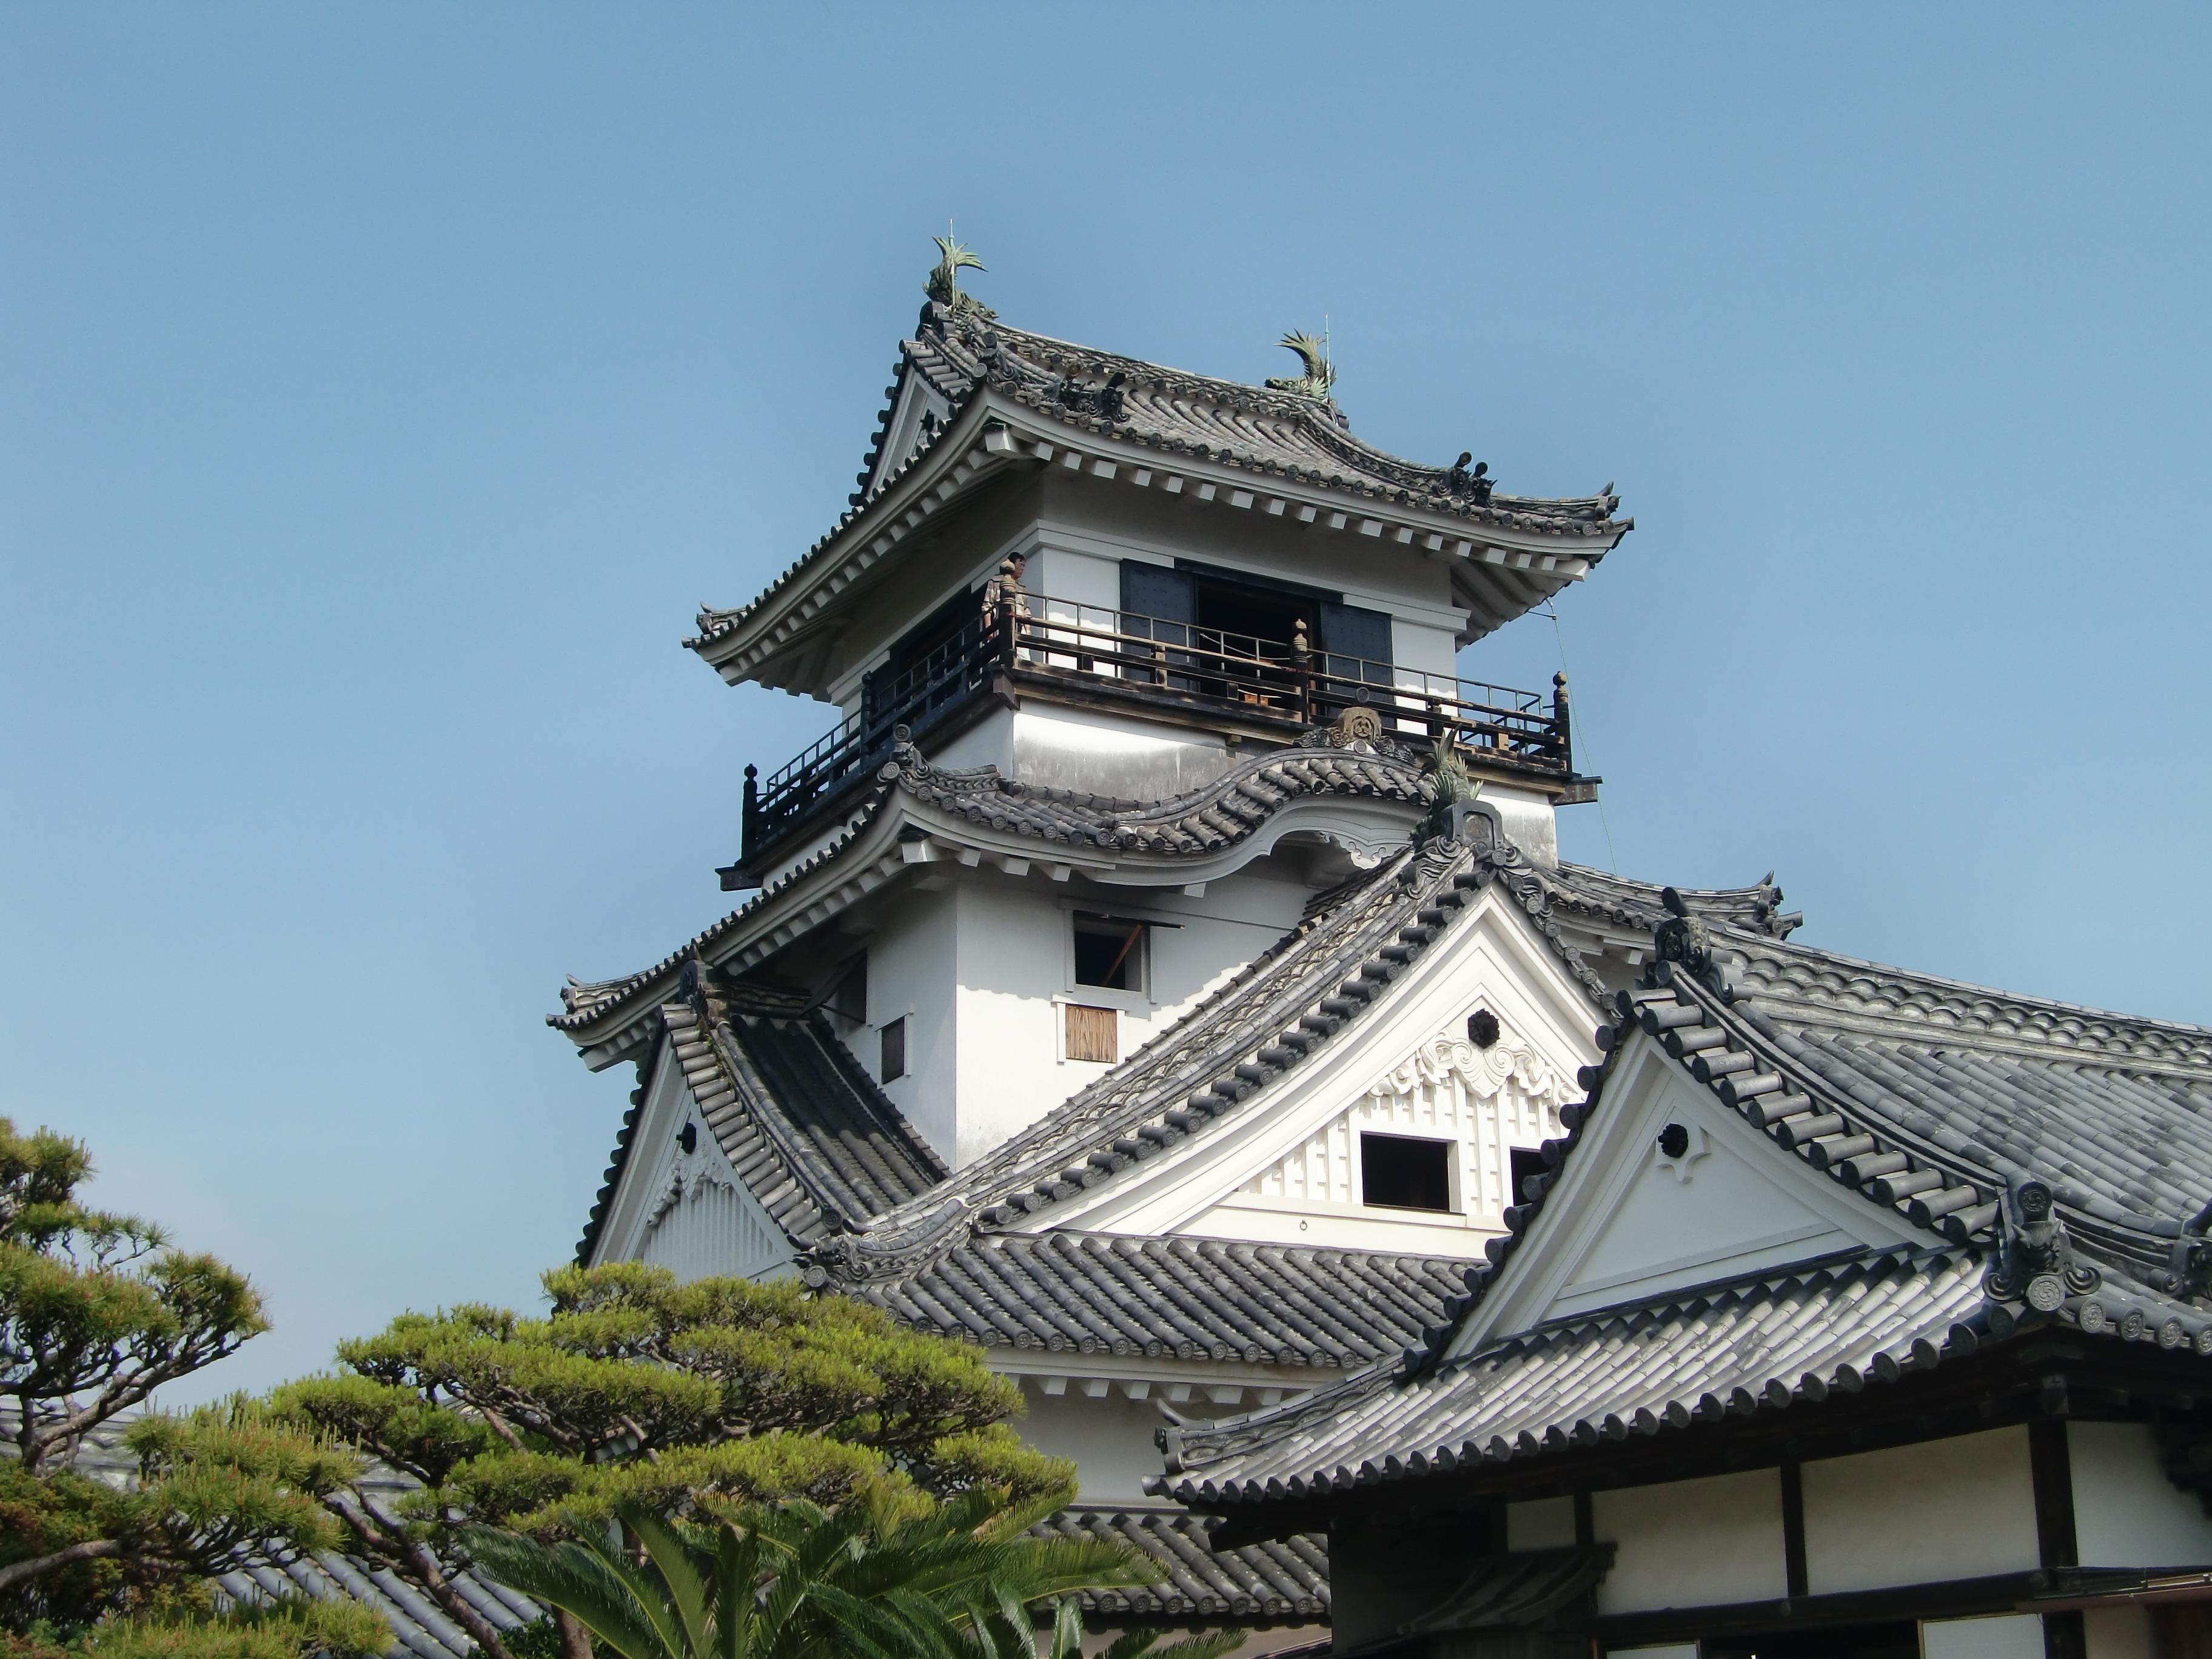 Kochi Castle (Shikoku)